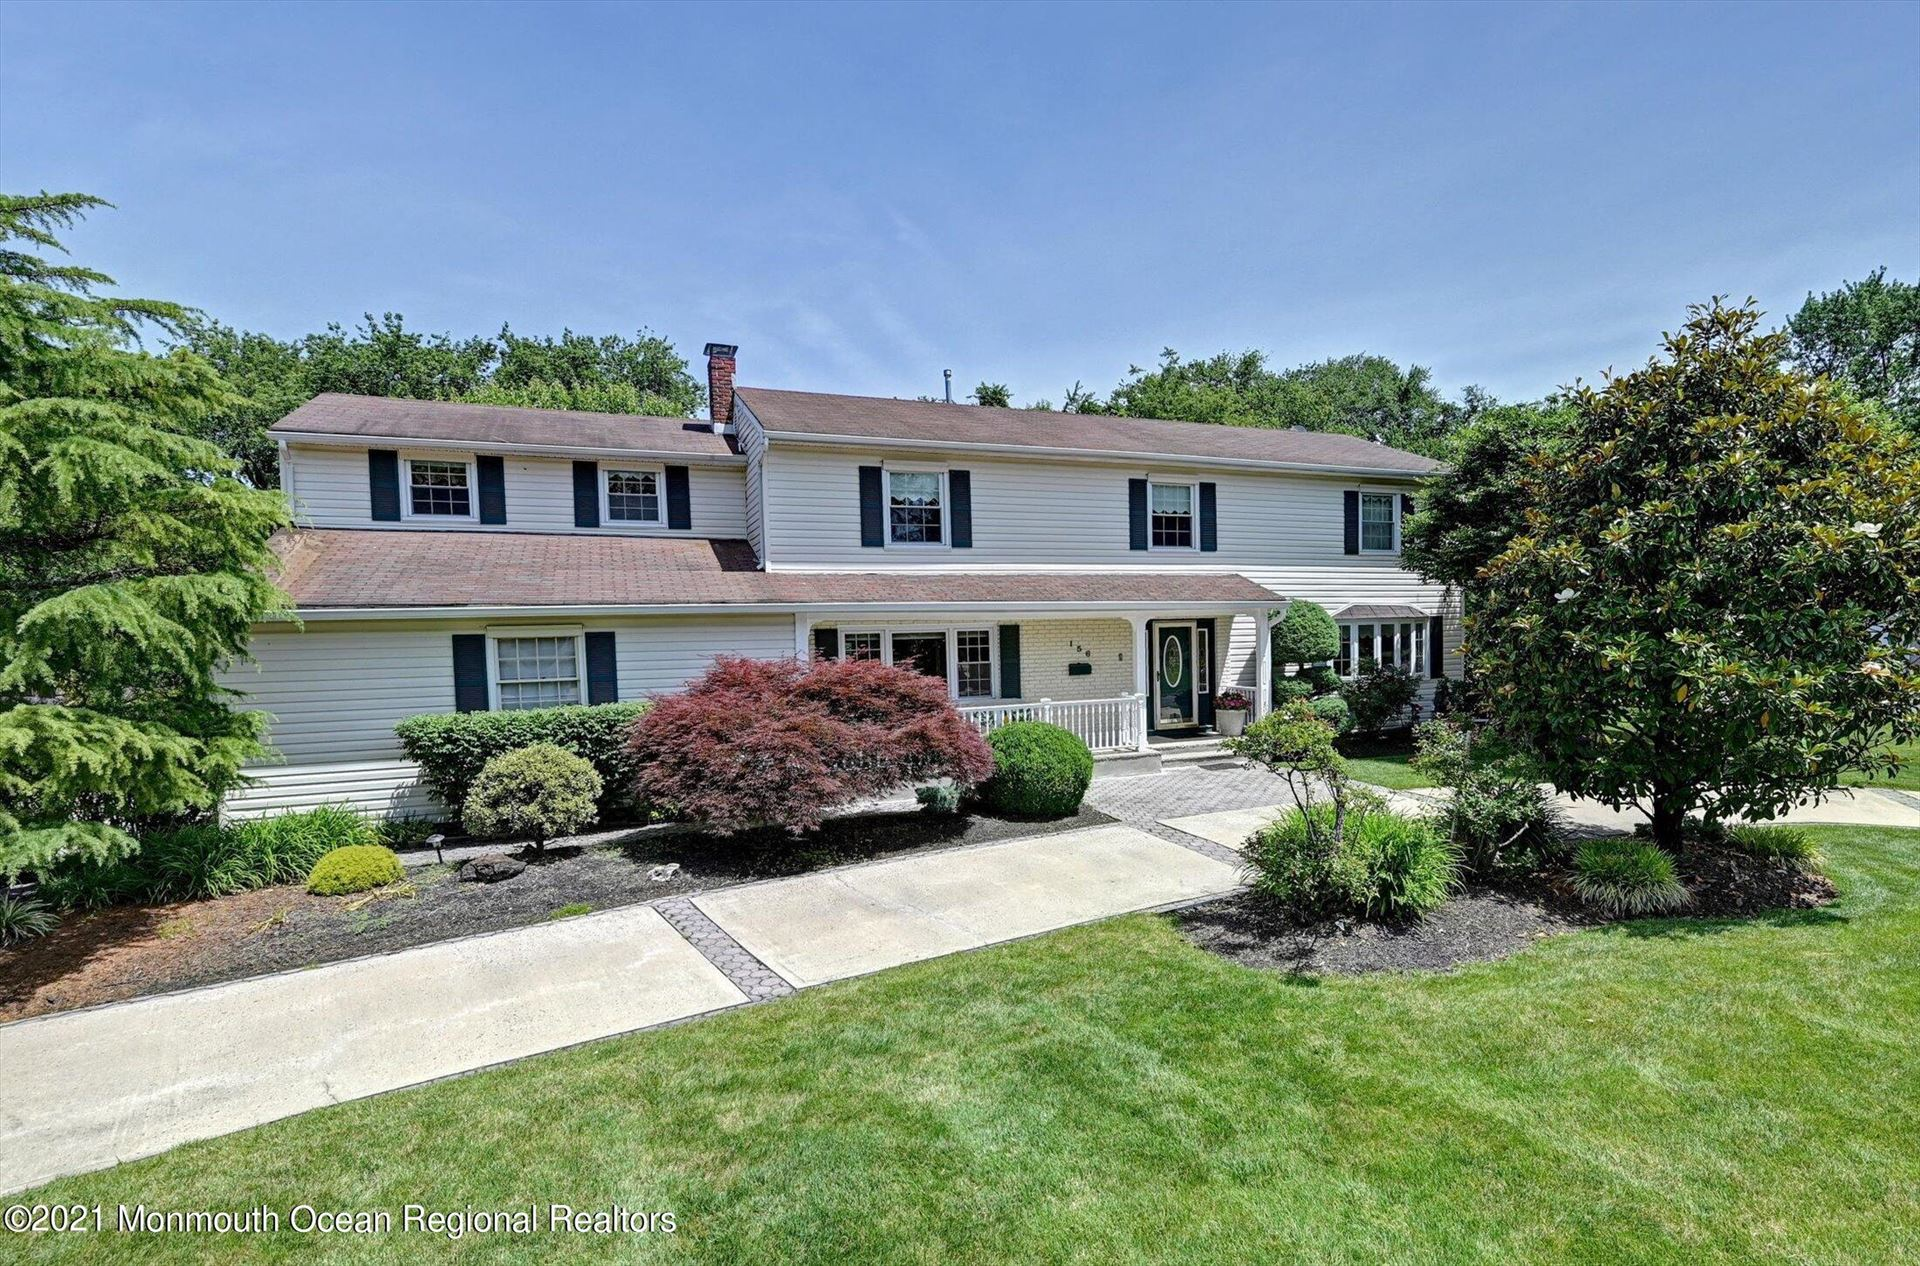 156 Coachman Drive, Freehold, NJ 07728 - MLS#: 22120348